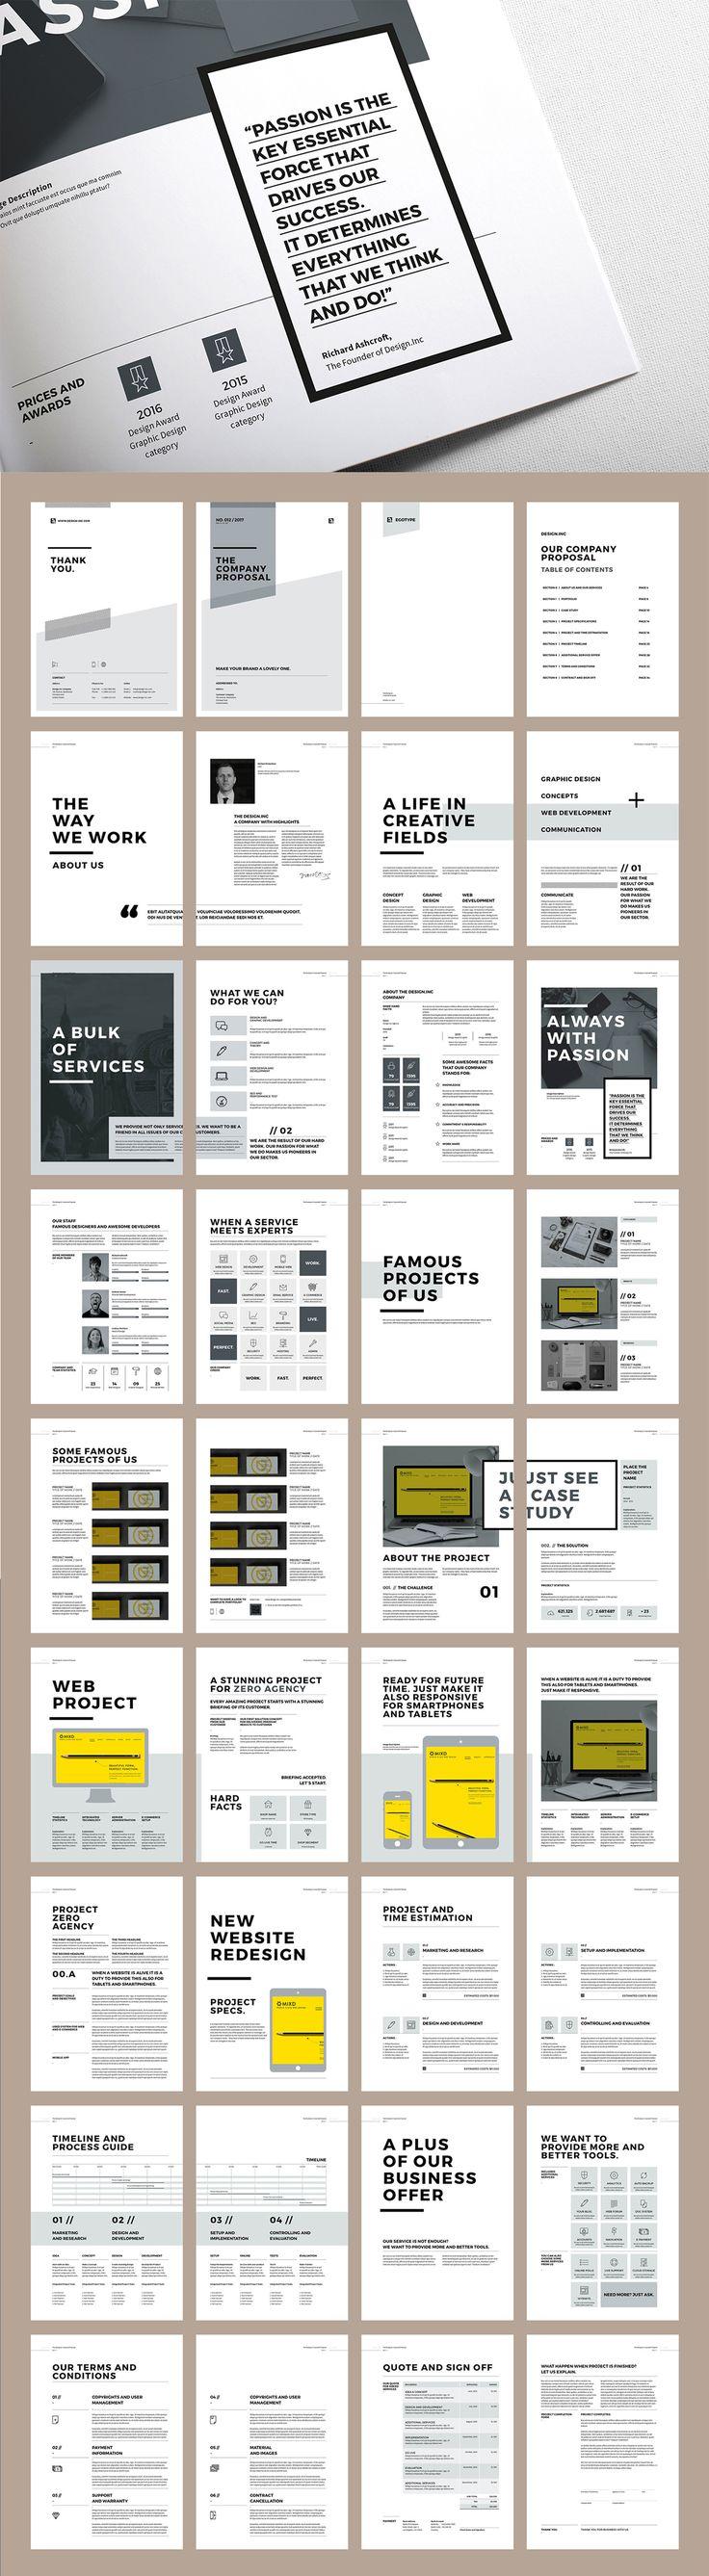 process document template microsoft word